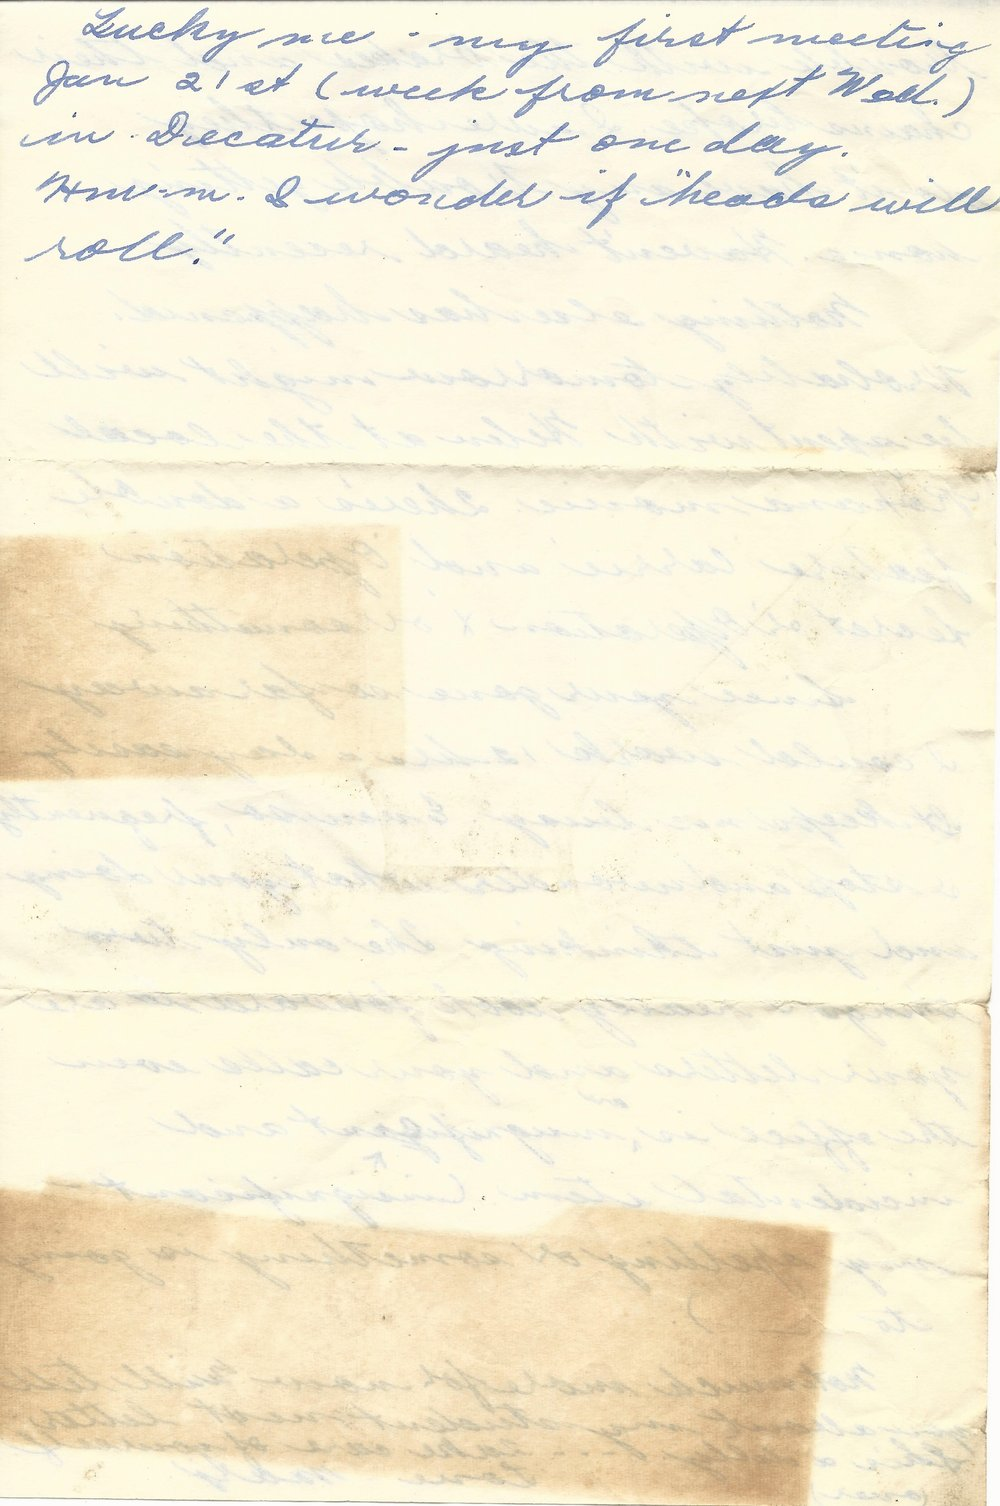 4. Jan. 9, 1953 (Oma)_Page_5.jpg